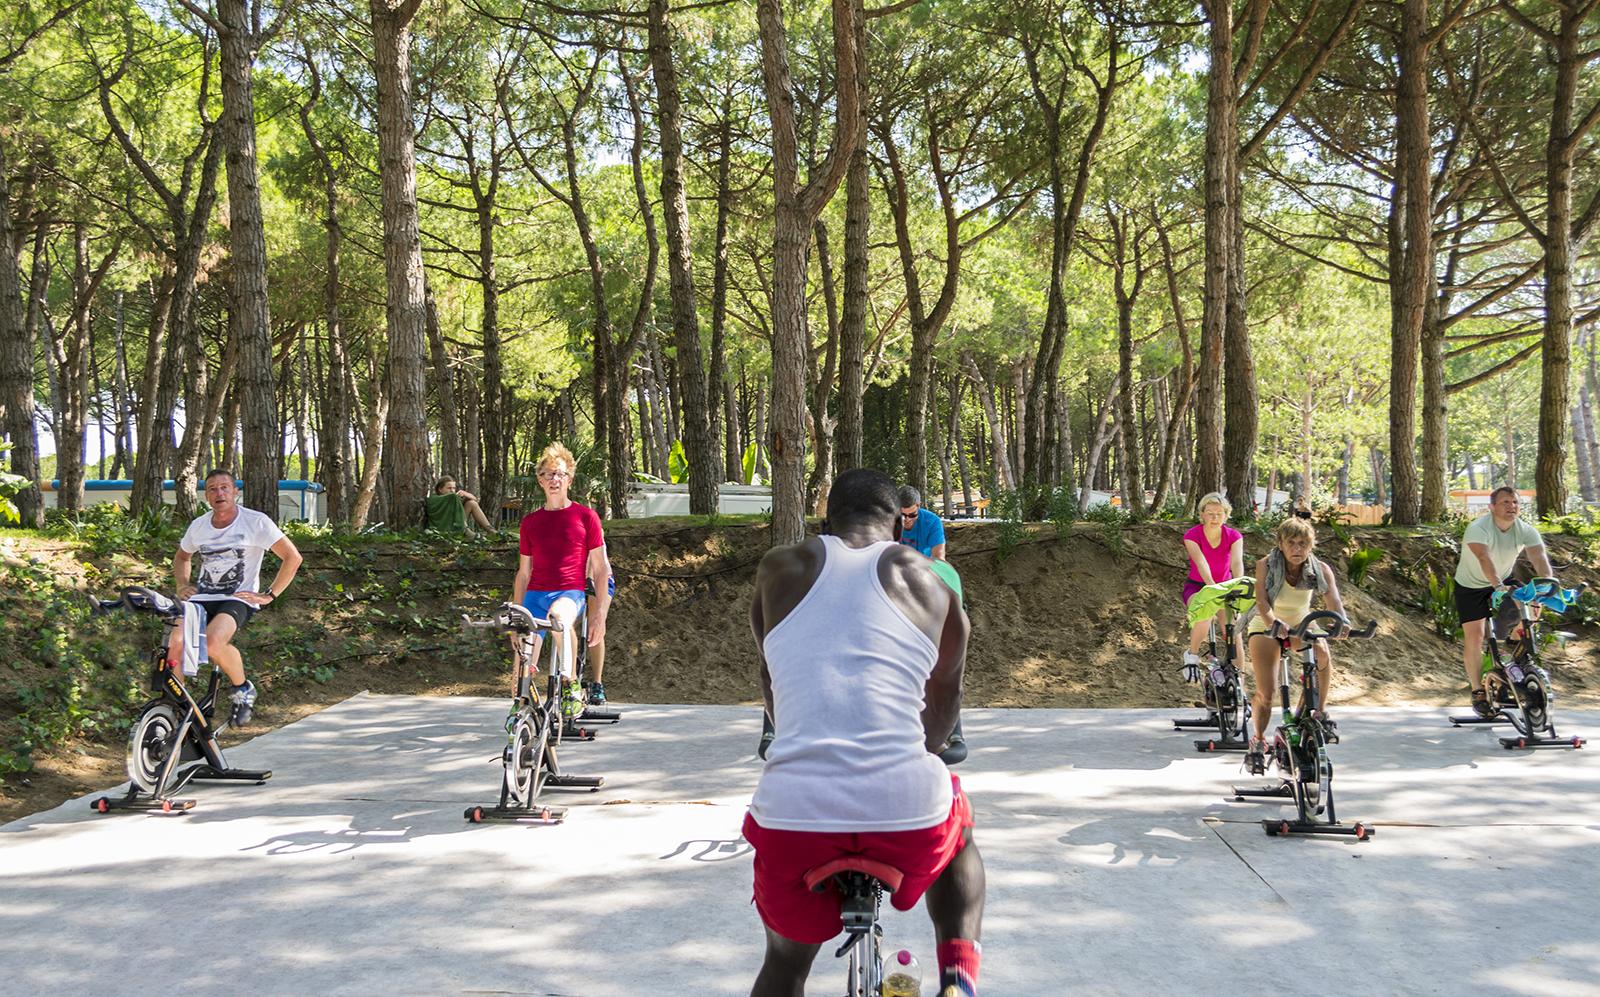 3-Spinning-spinbike-sport-Camping-village-Mediterraneo-Cavallino